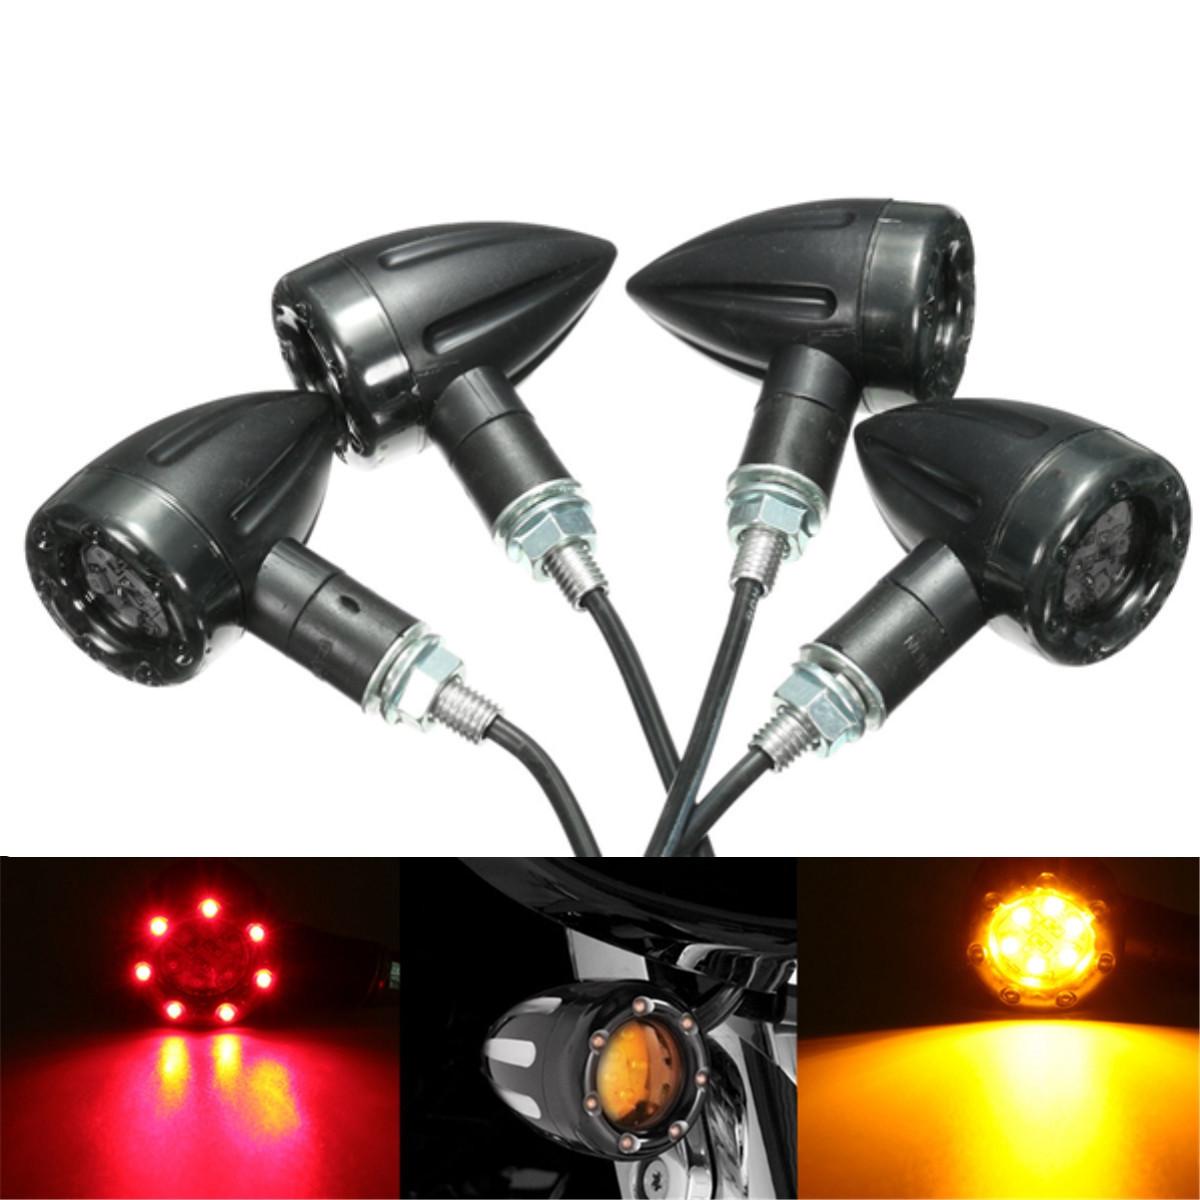 4pcs Universal Motorcycle Led Turn Signal Indicators Light